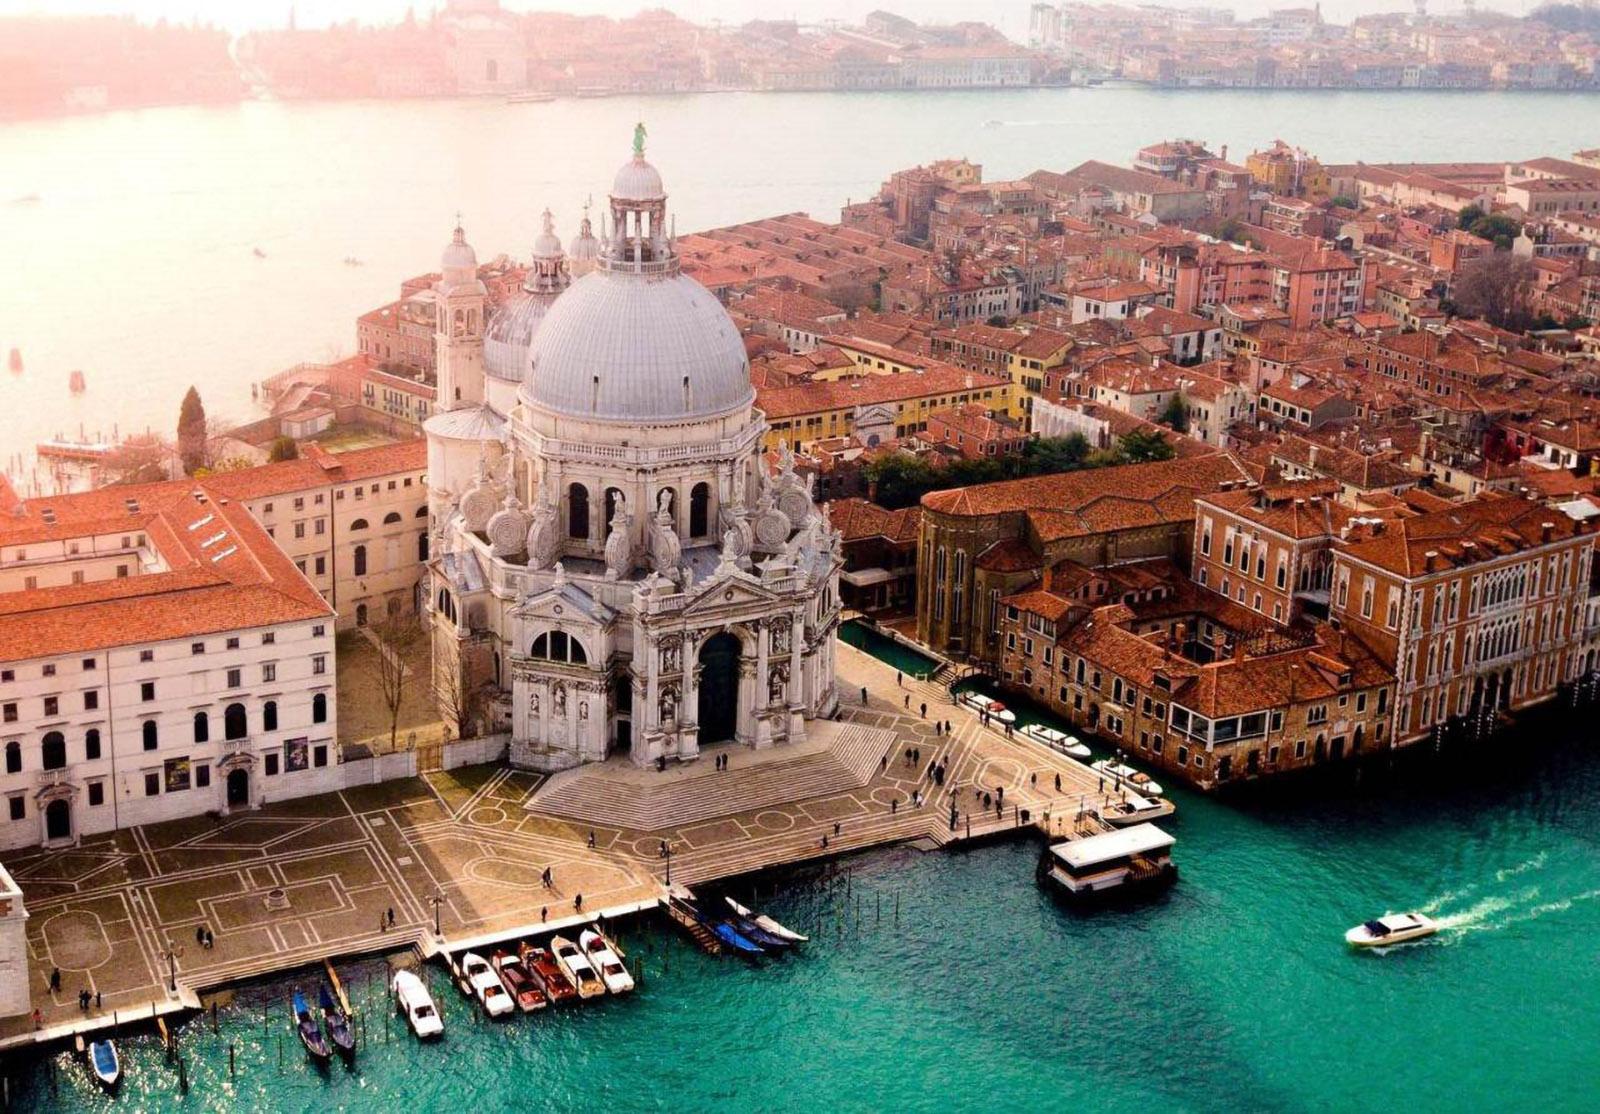 Basilica madonna salute Venezia vista aerea